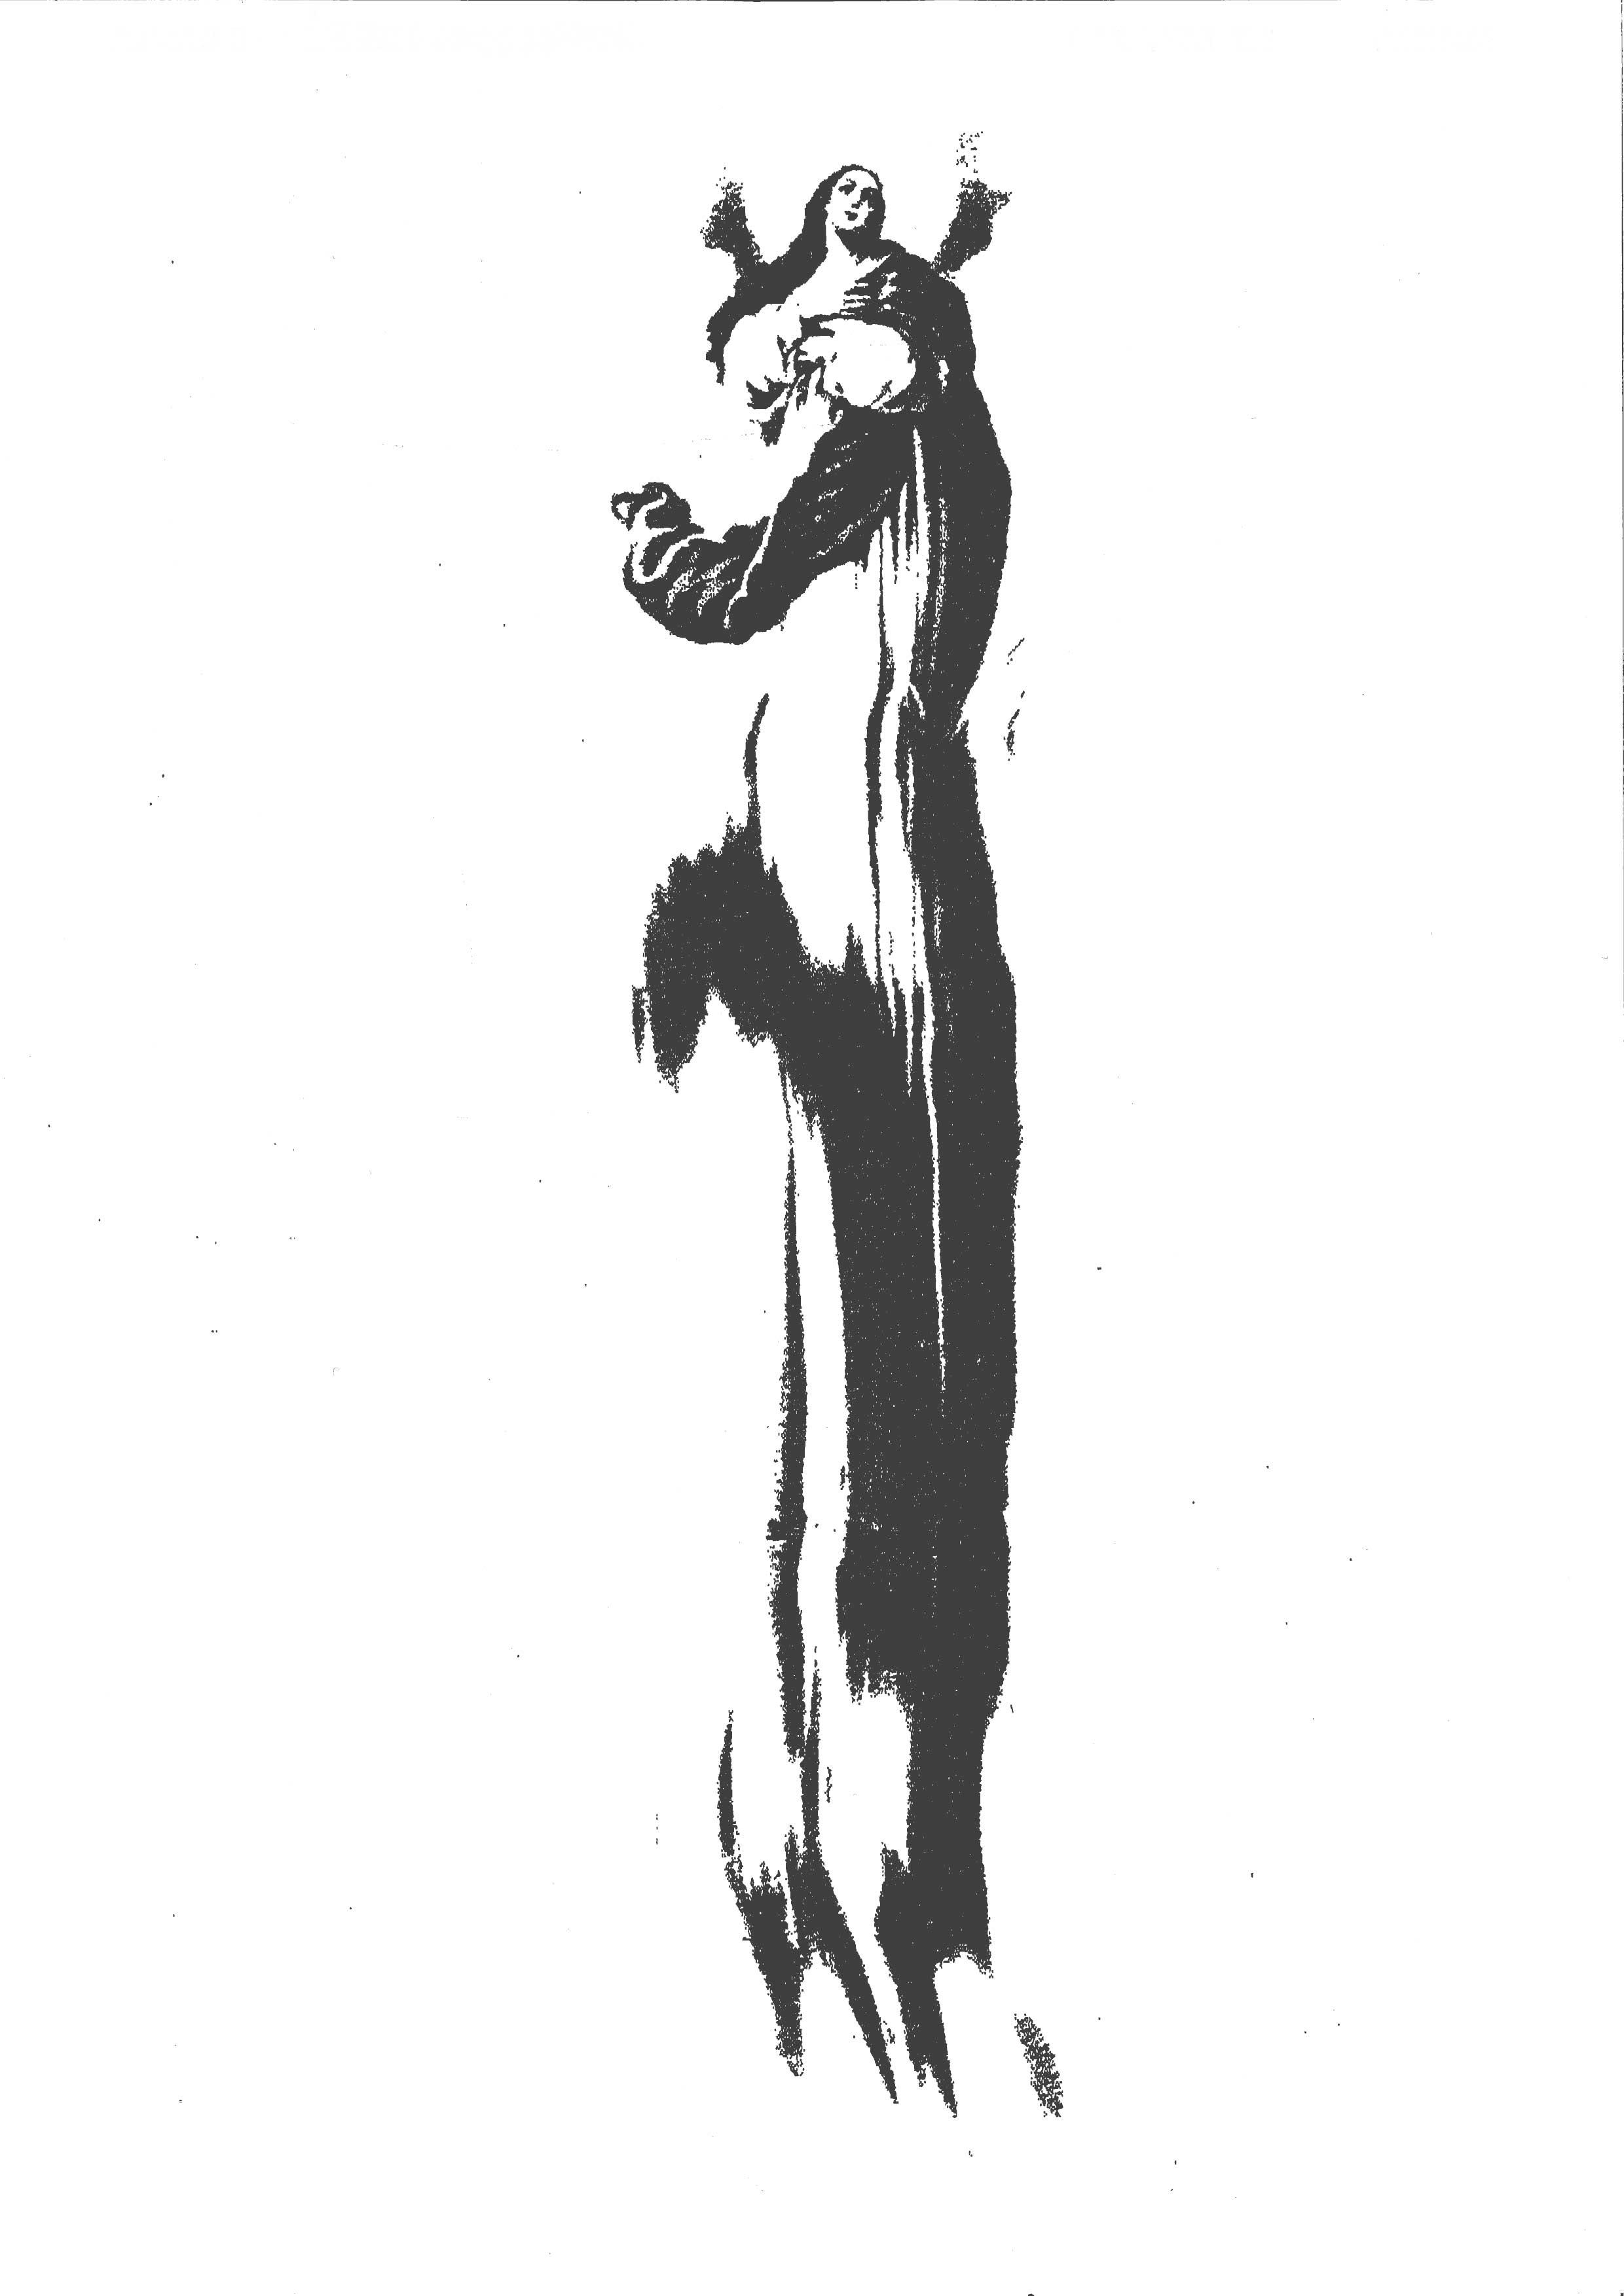 La Inmaculada (1986) - Agustín Parejo School